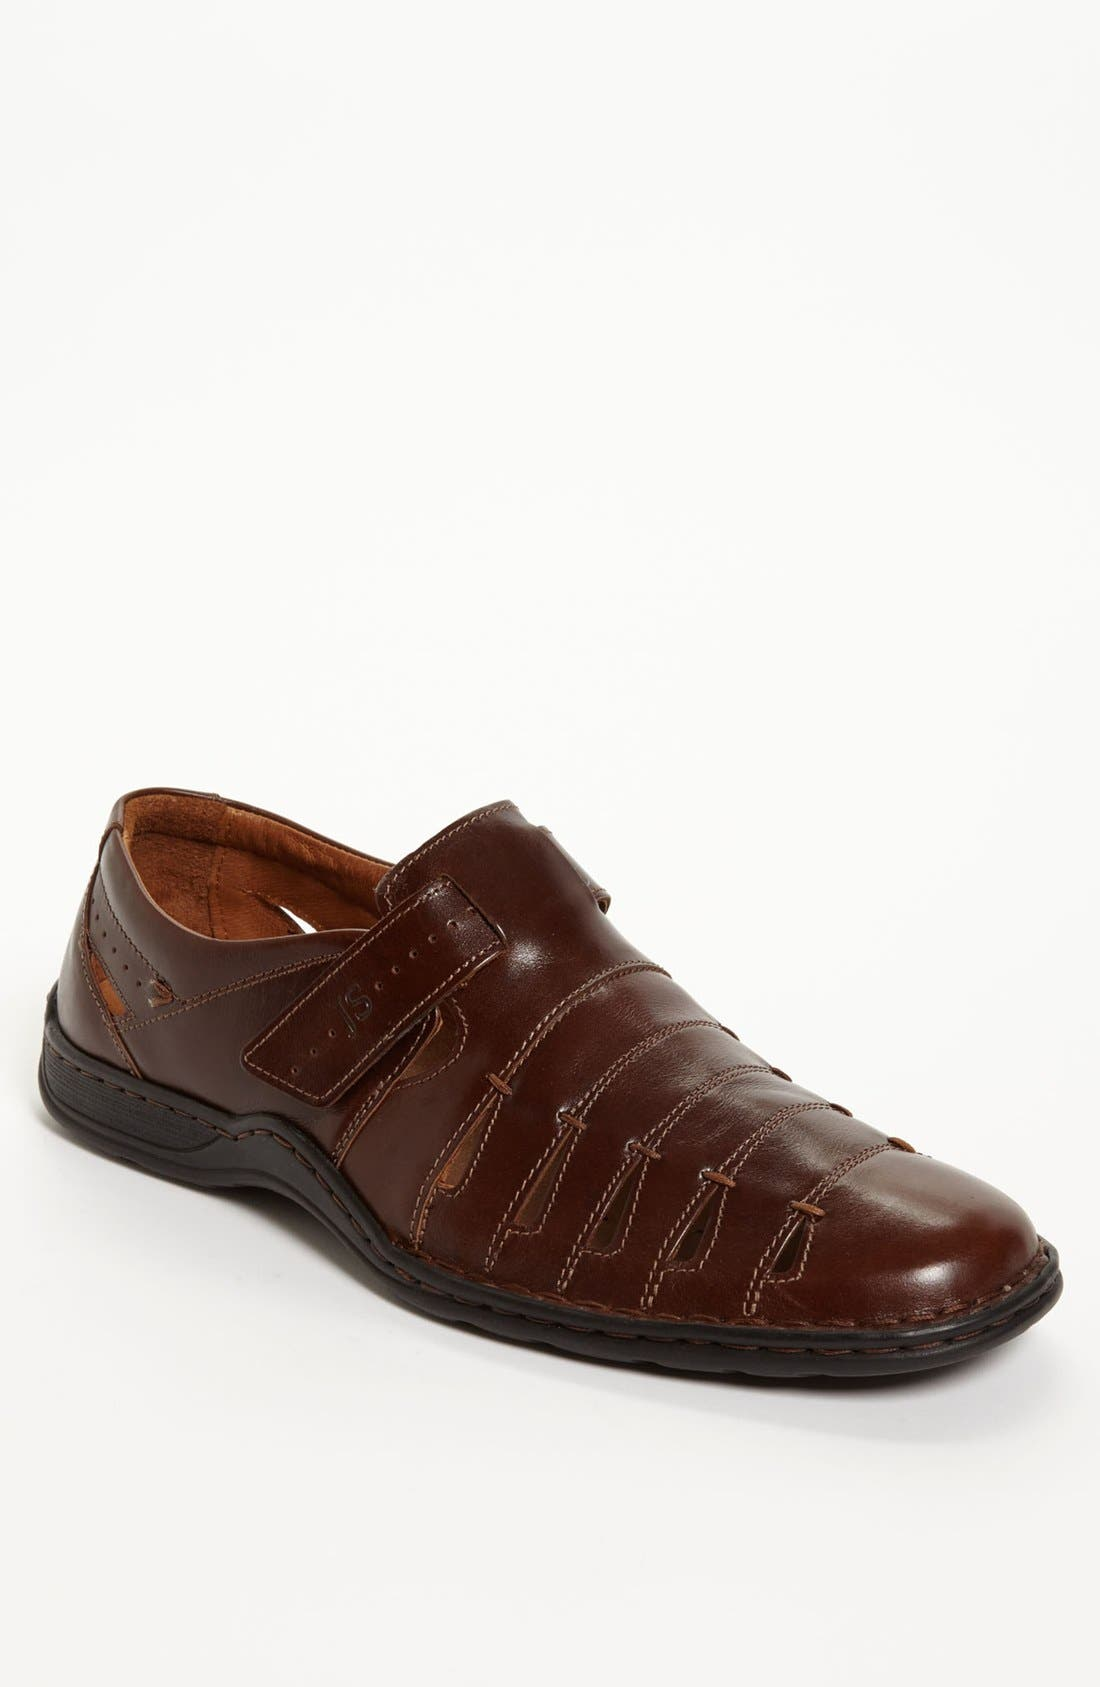 'Lionel 06' Sandal,                             Main thumbnail 1, color,                             Brown/ Brown Leather